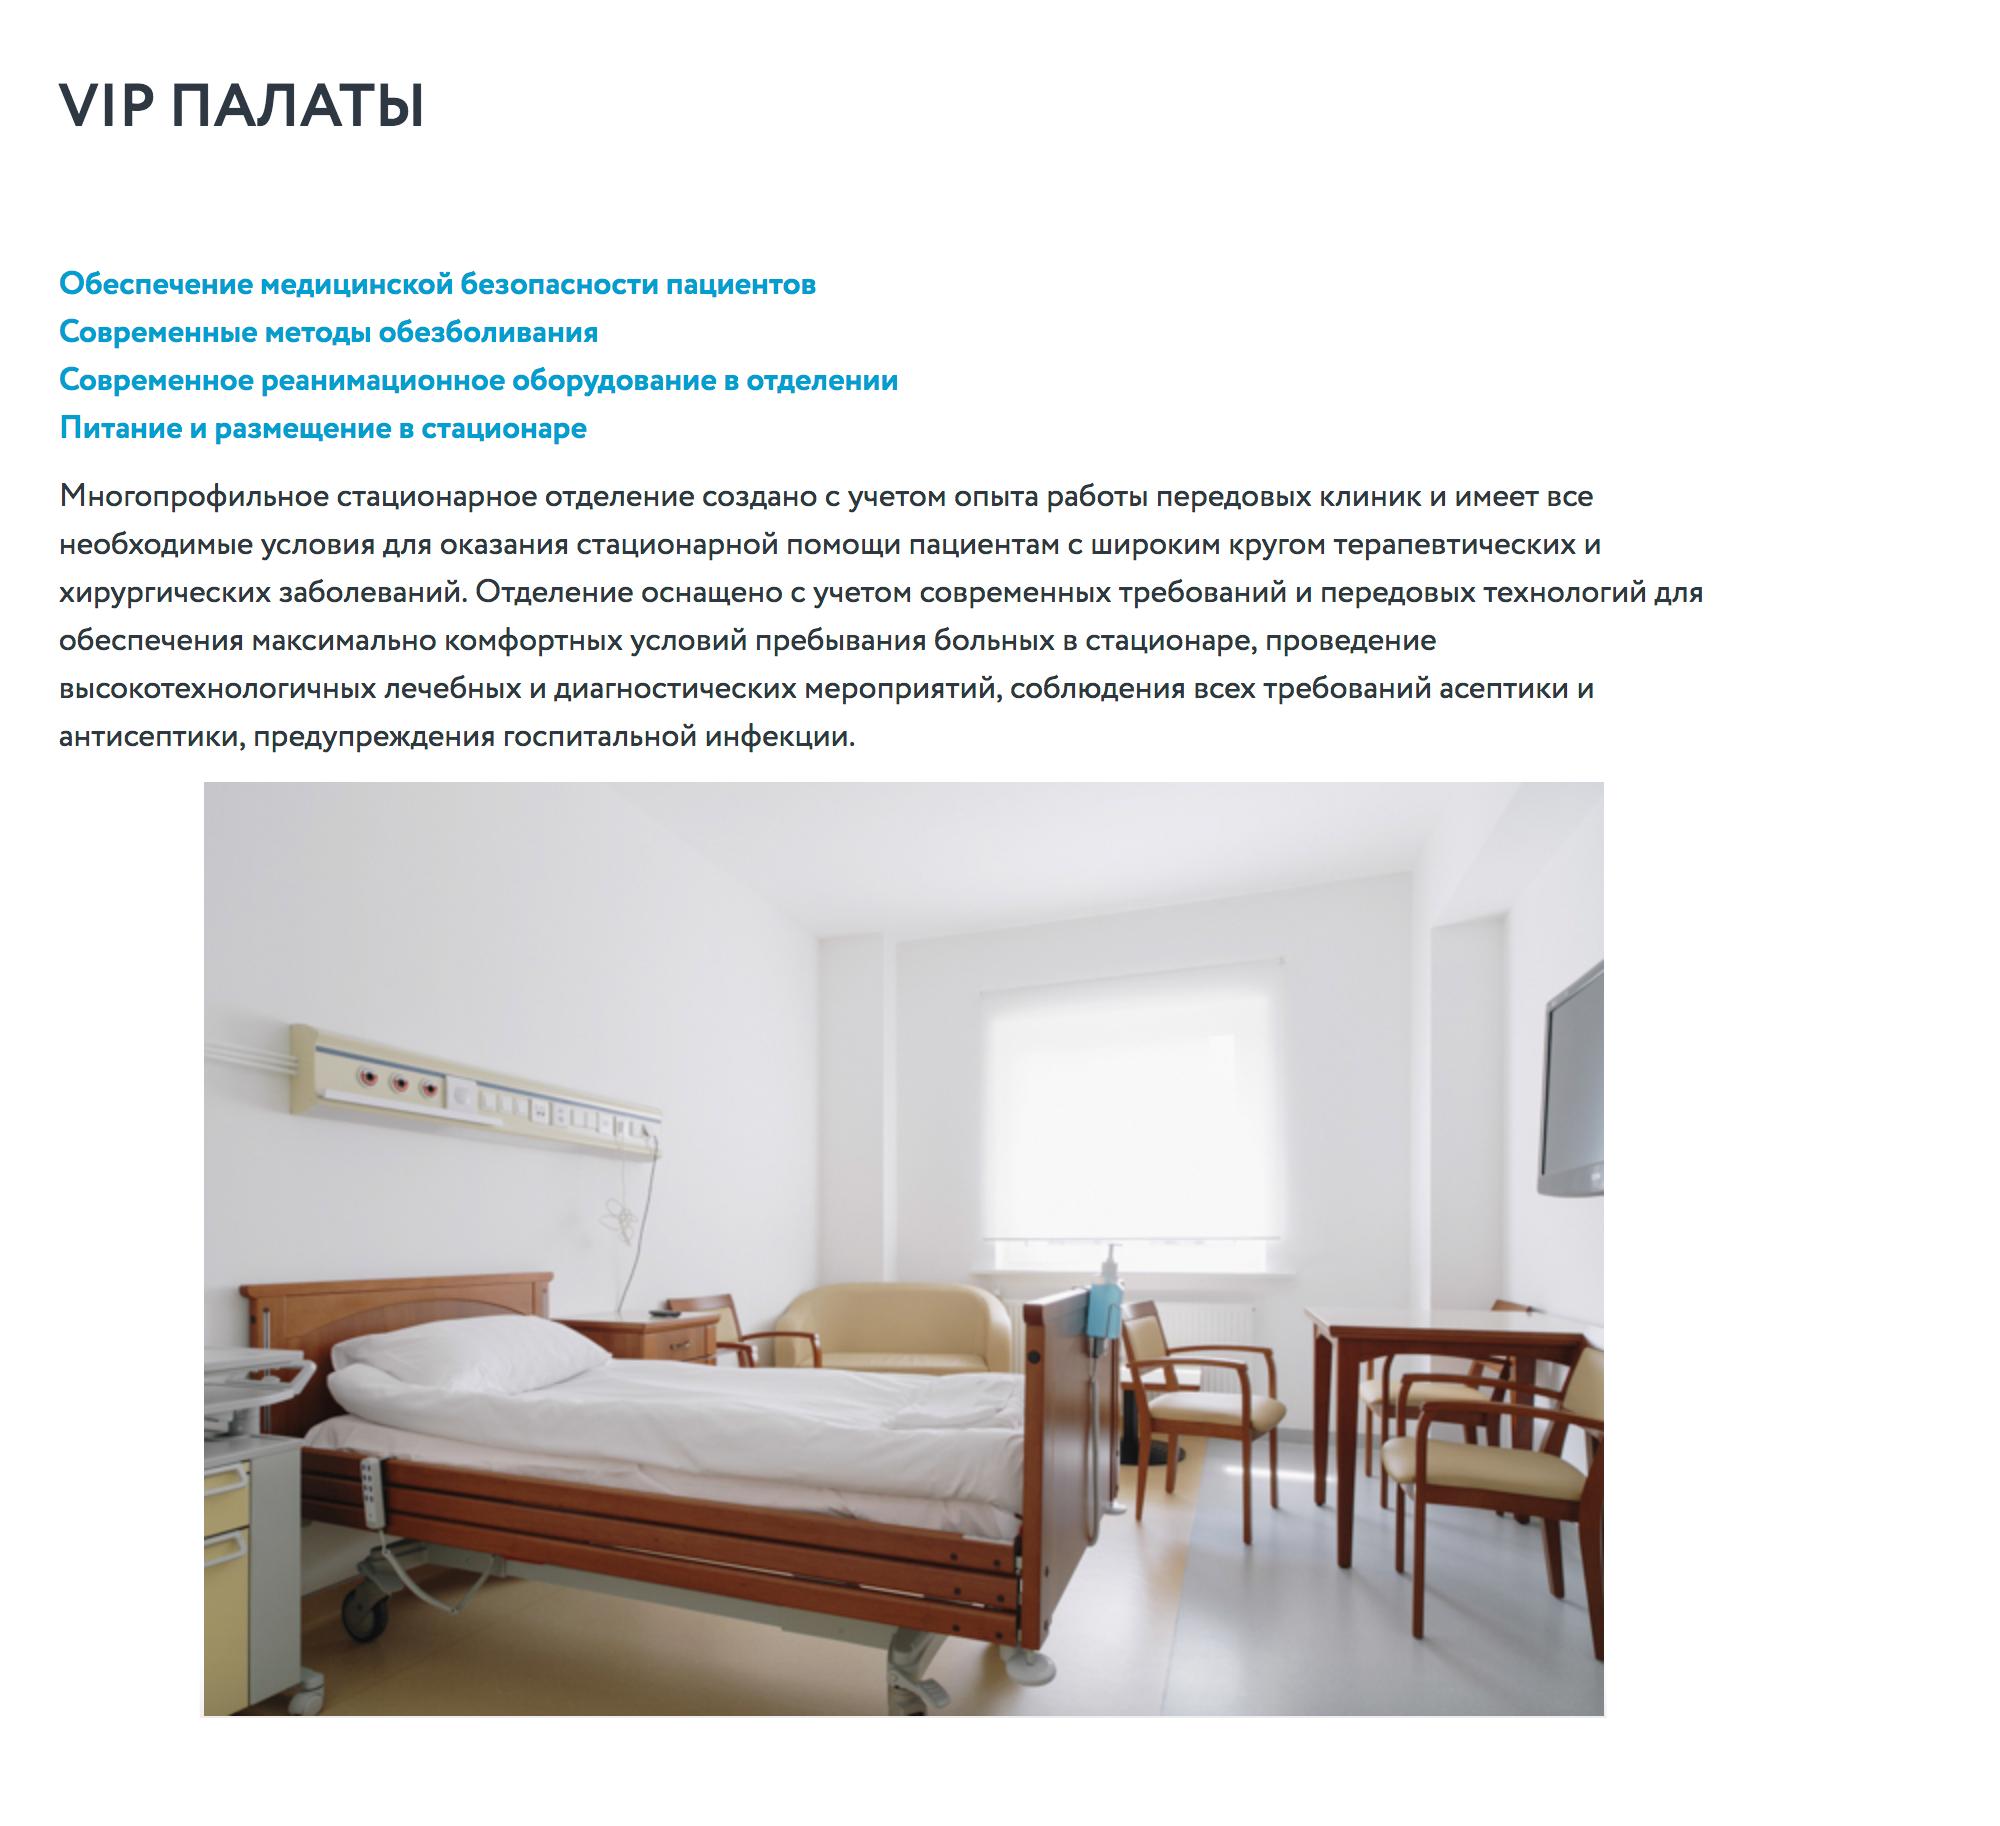 Вип-палата в московской горбольнице № 31 за 14 900<span class=ruble>Р</span> в сутки